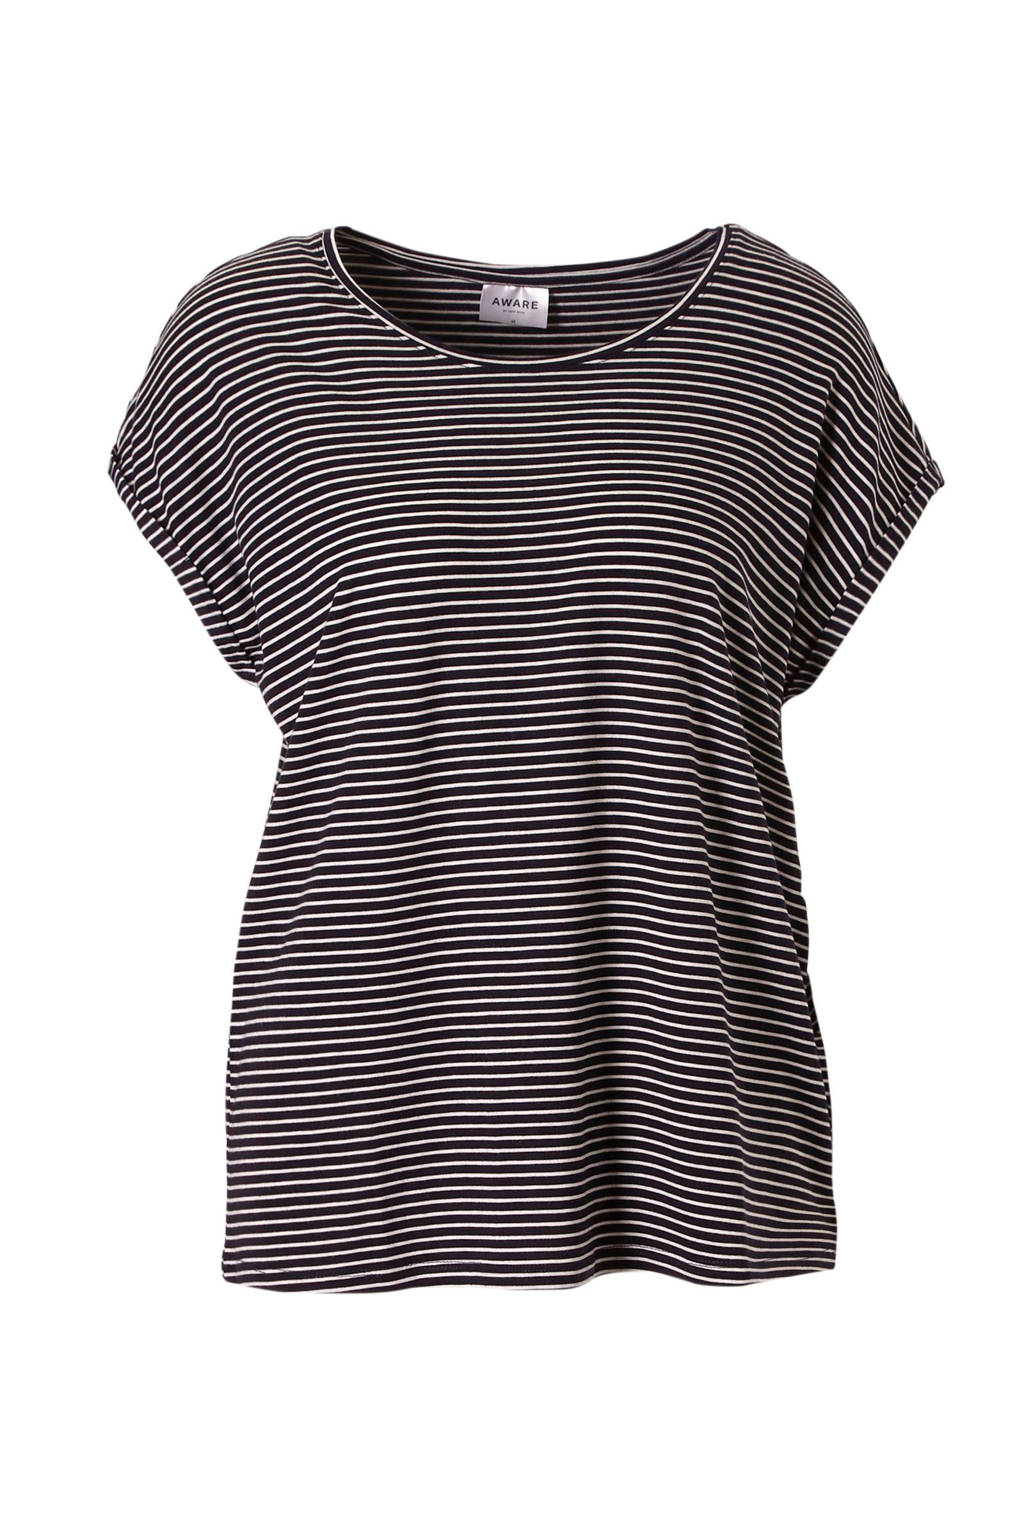 AWARE by VERO MODA gestreept T-shirt, Zwart/wit